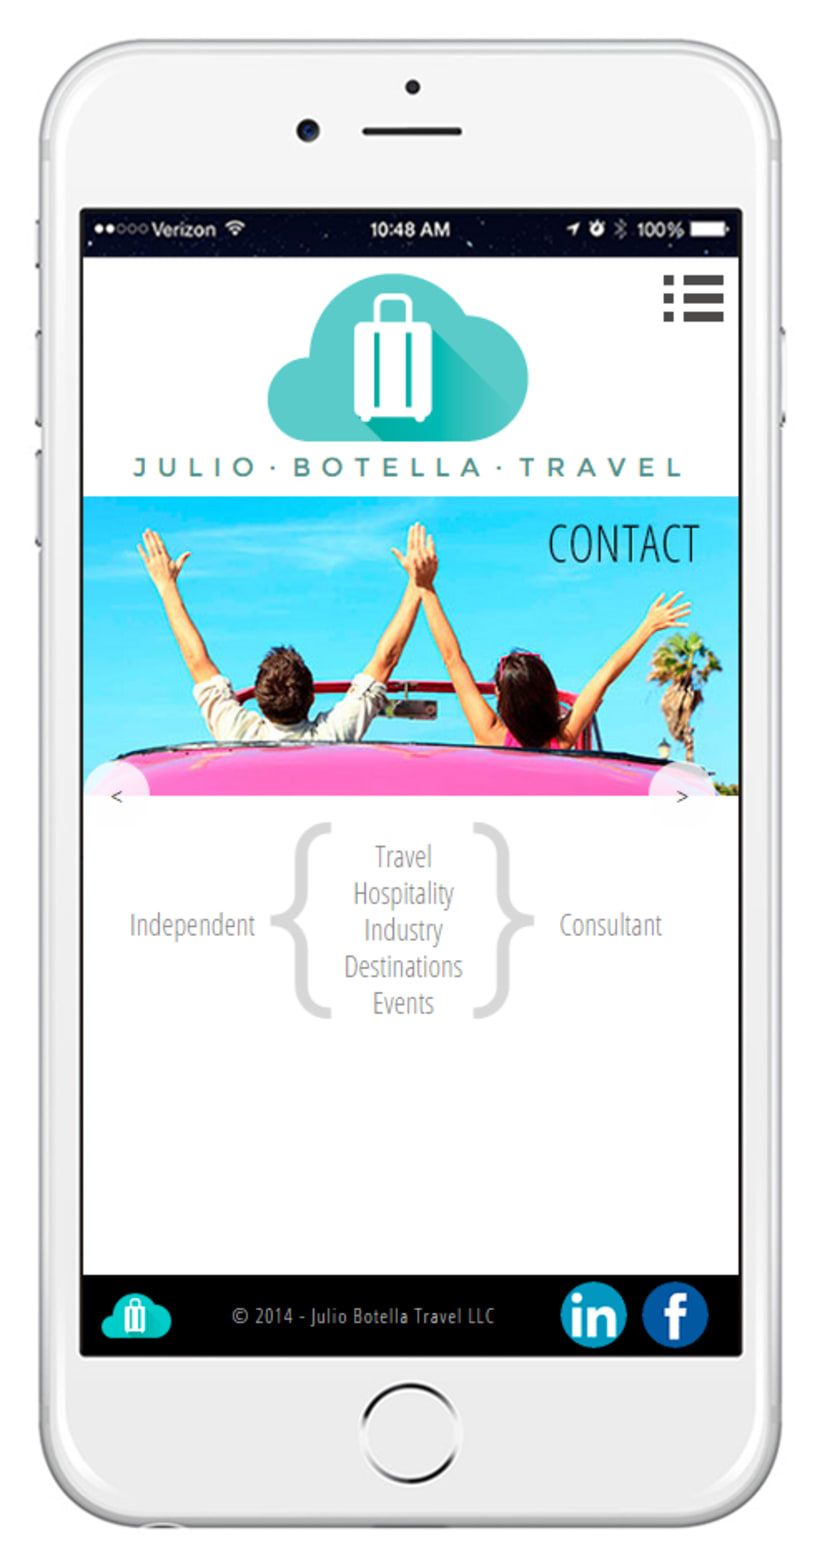 juliobotellatravel.com -responsive- 2